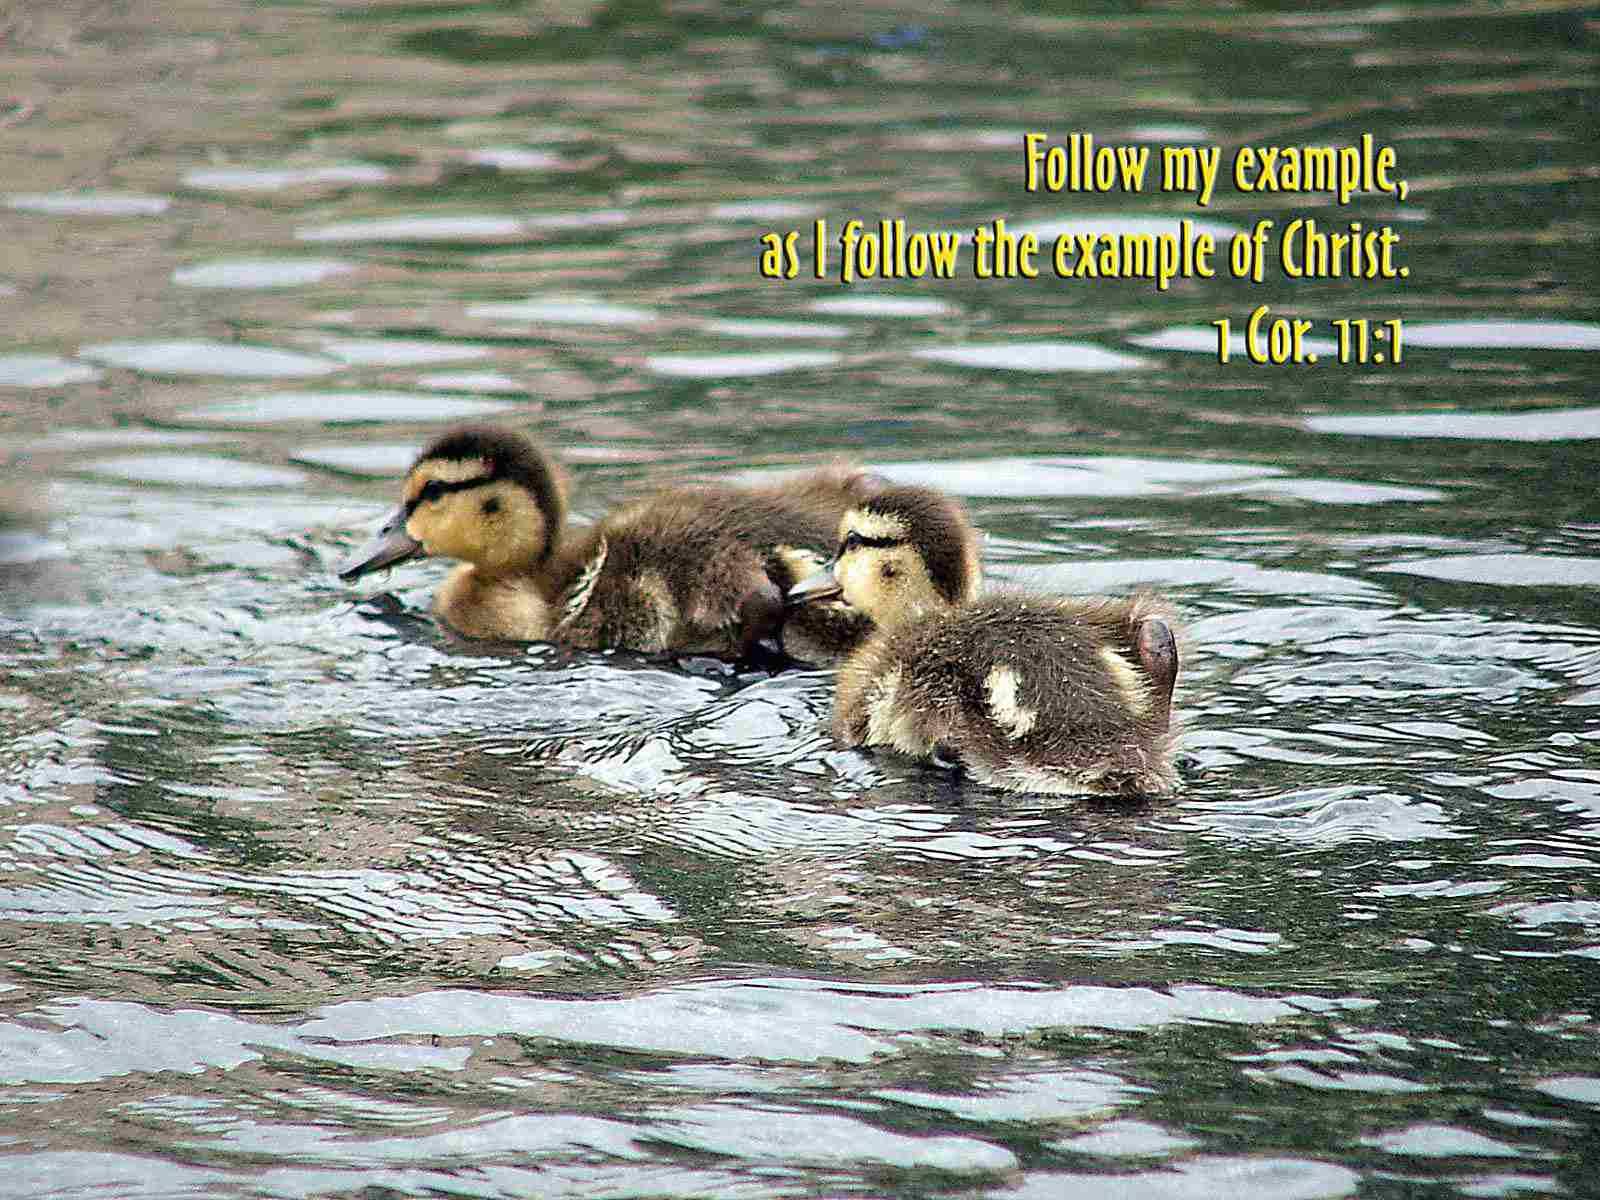 Baby Ducks Wallpaper with bible verse